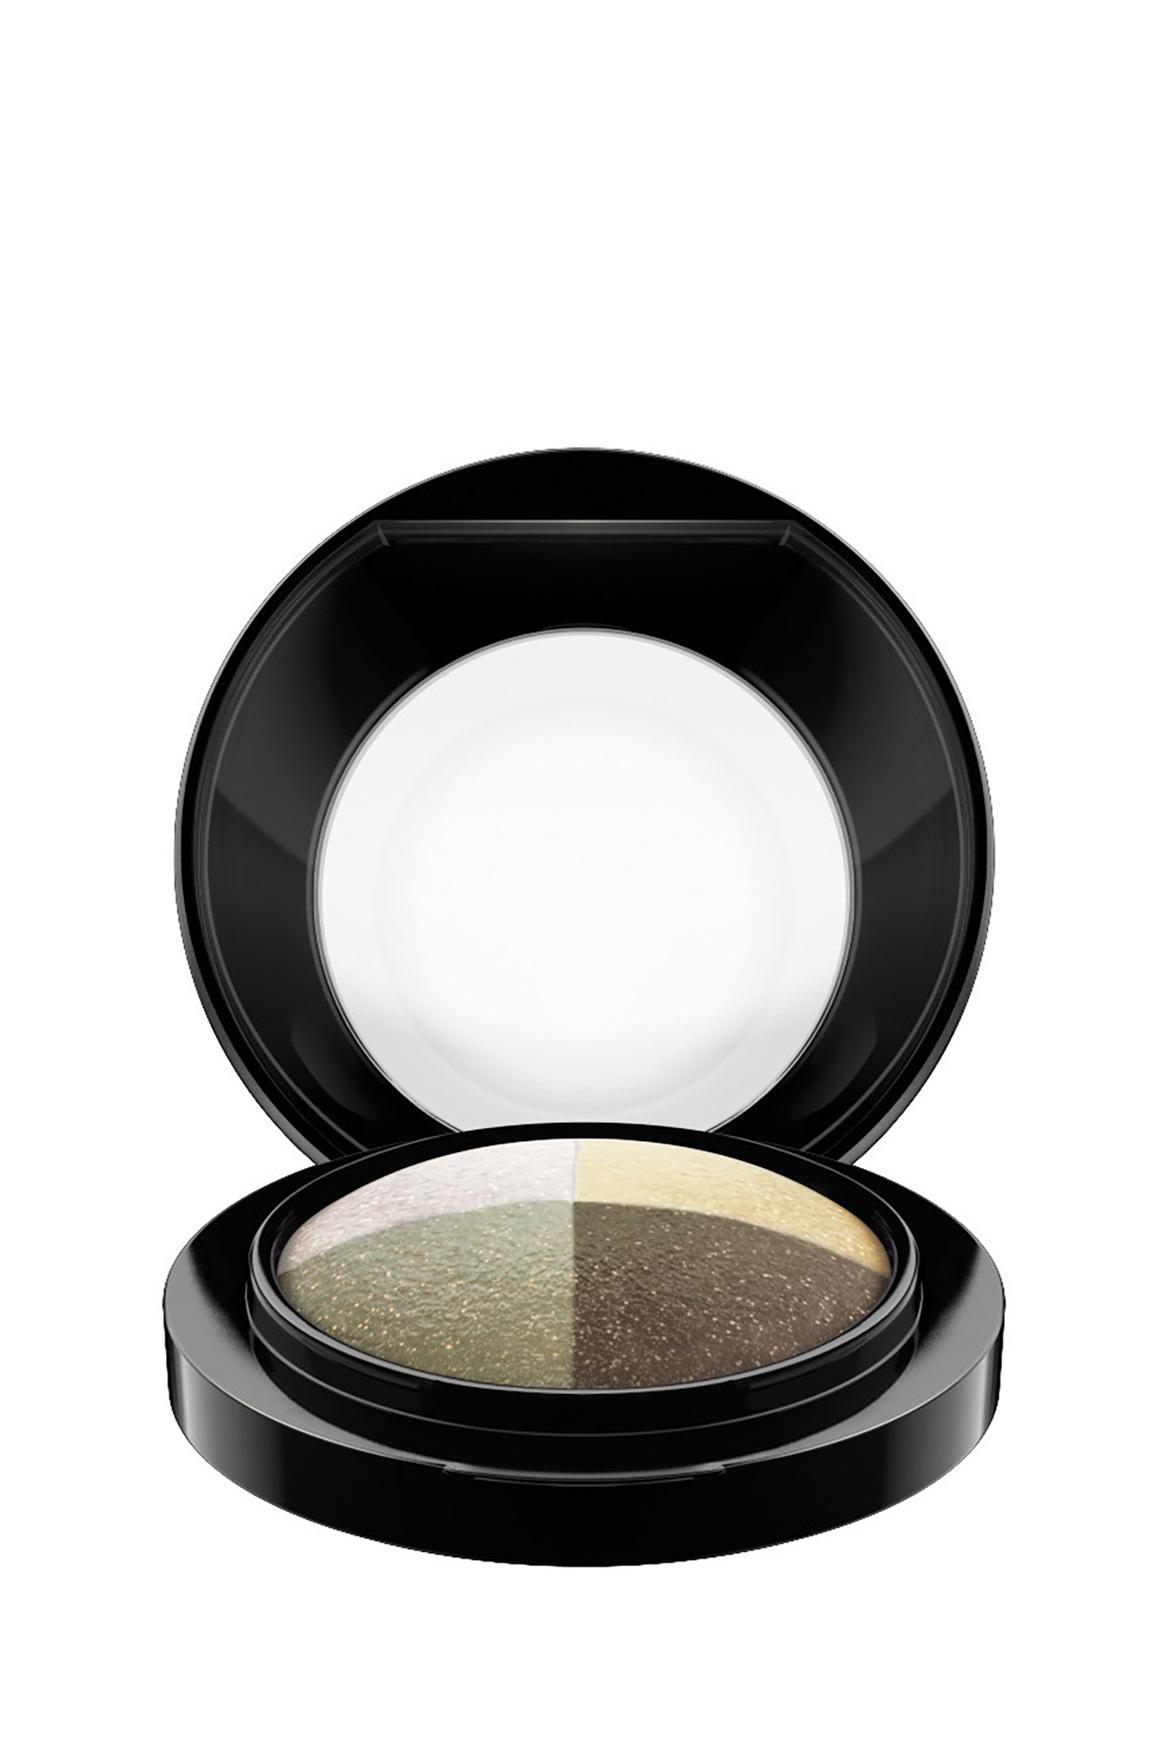 MAC | Mineralize Eye Shadow Quad | Myer Online